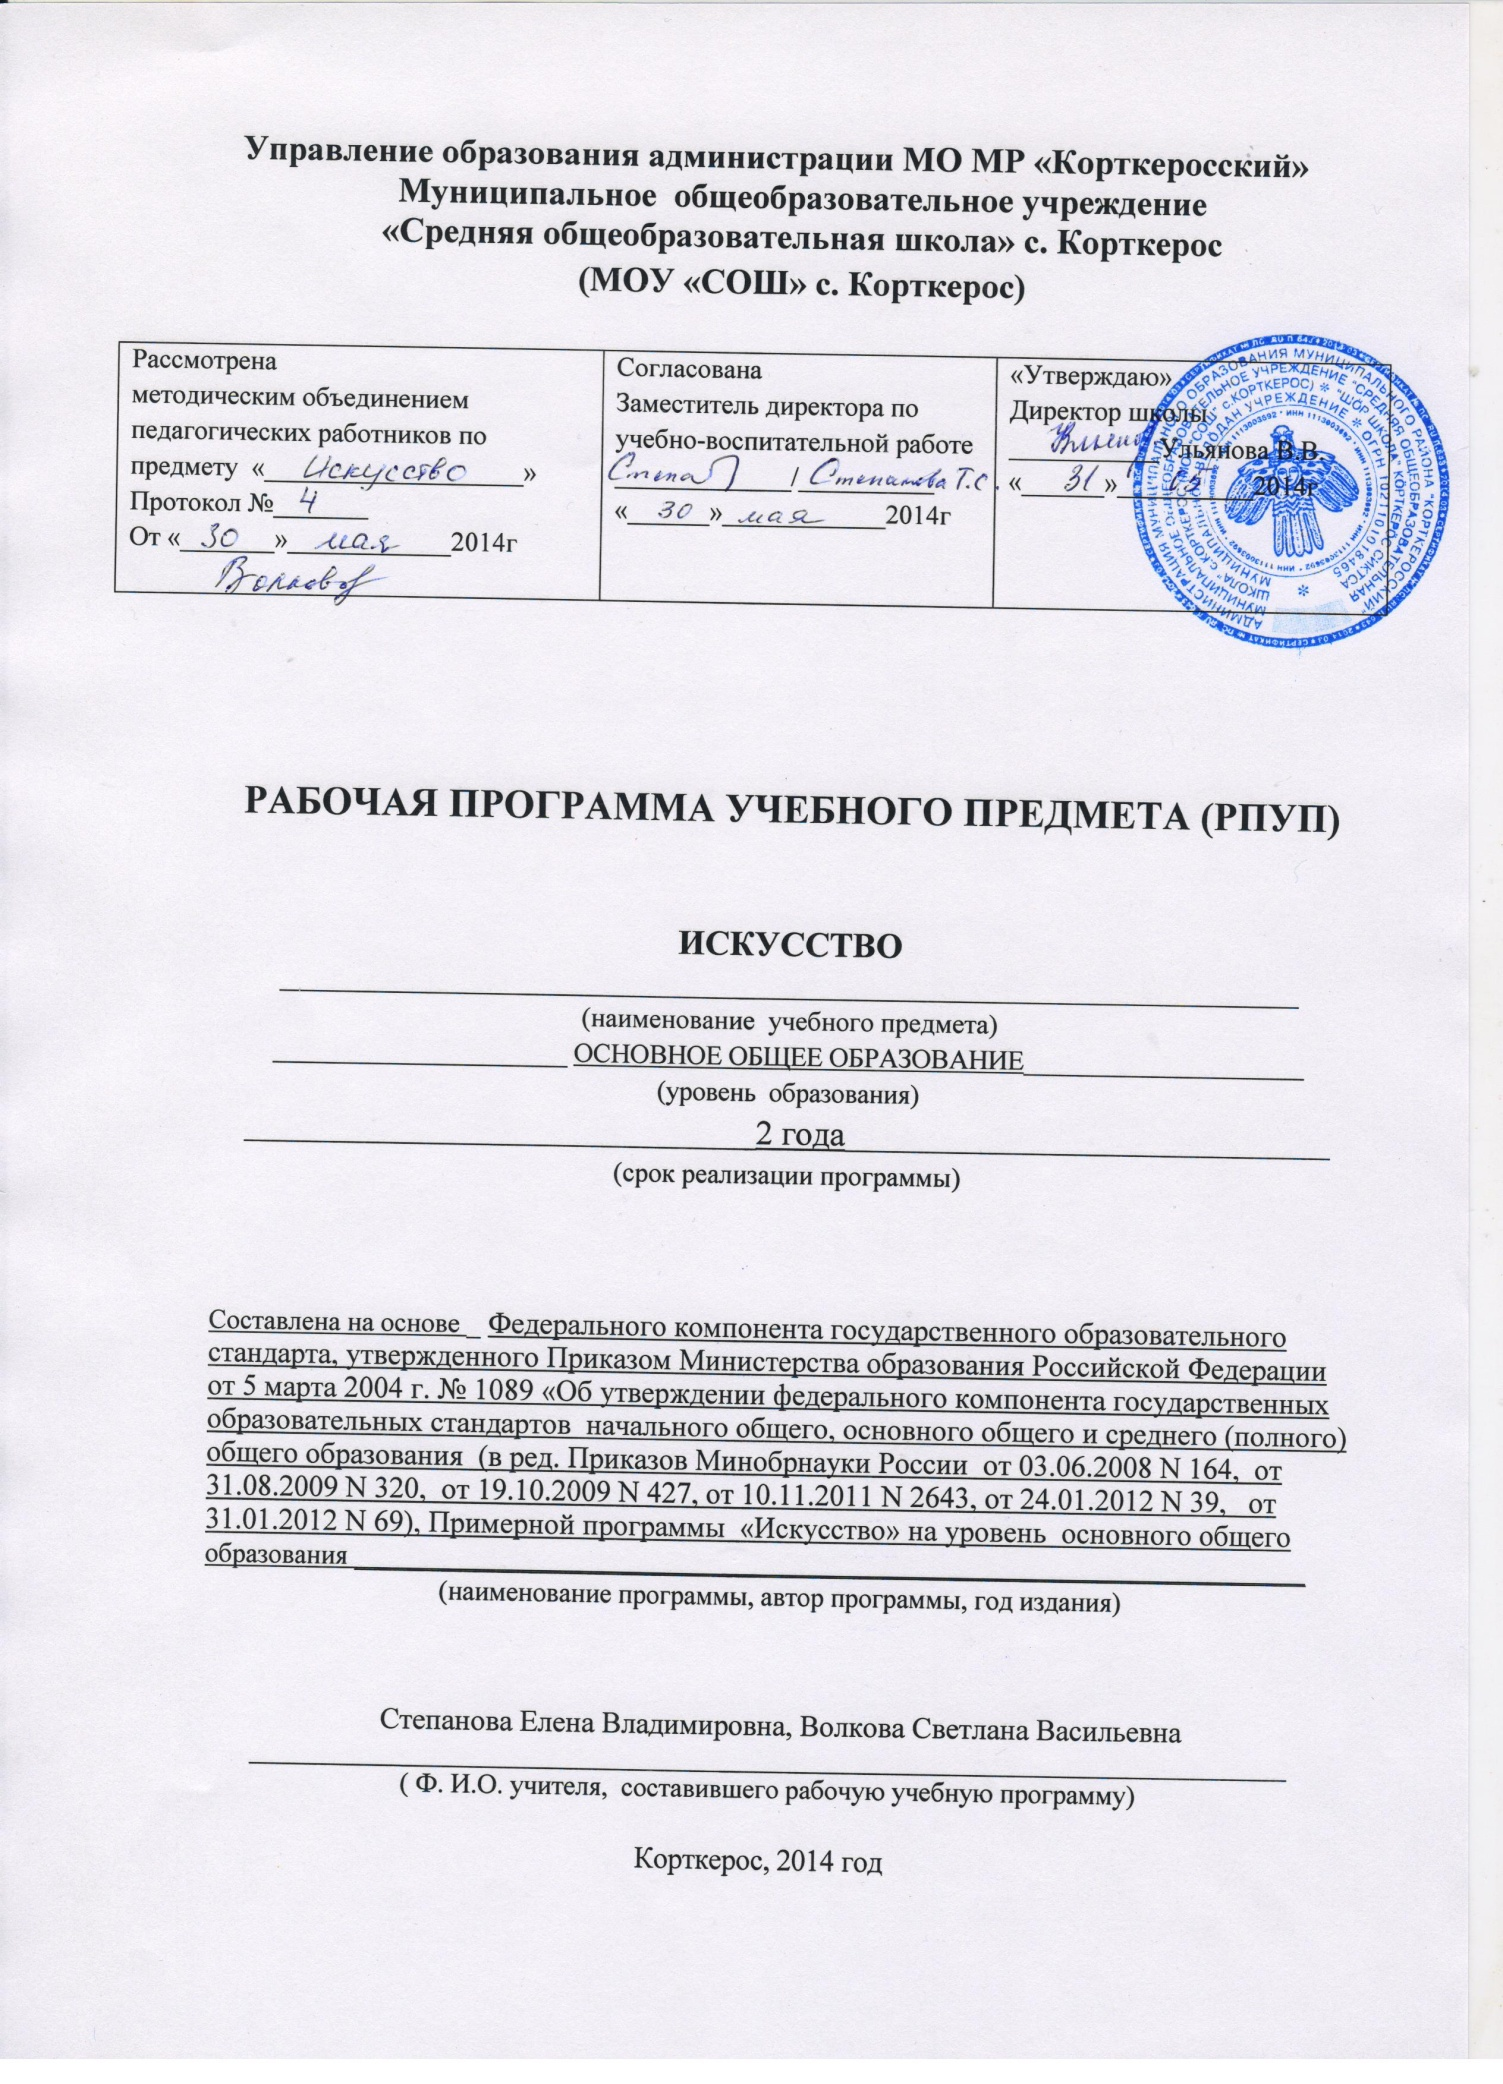 D:\Мои документы\РАБОЧИЙ СТОЛ\Титульники ООО 2014\001.jpg